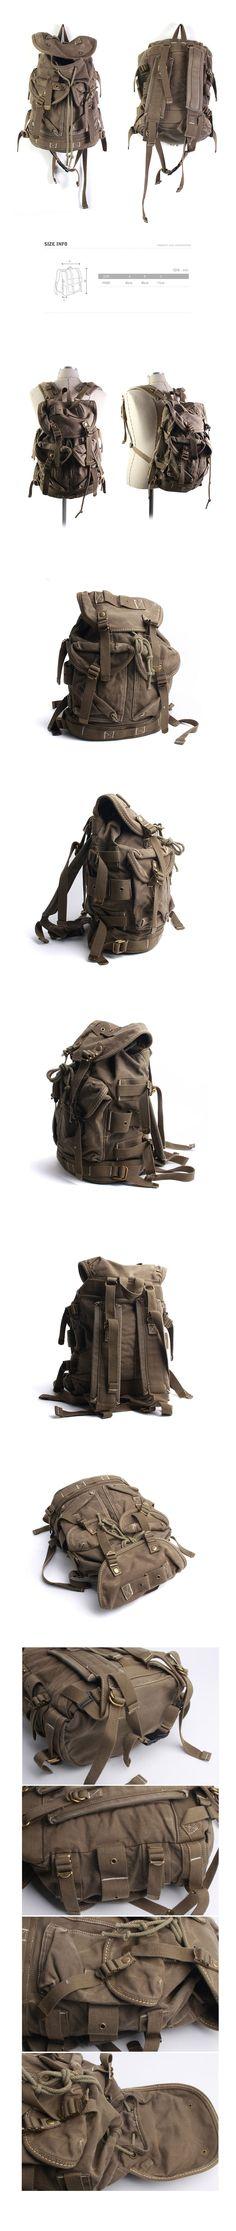 Vintage Canvas Outdoor Military Rucksack Backpack Travel Bag